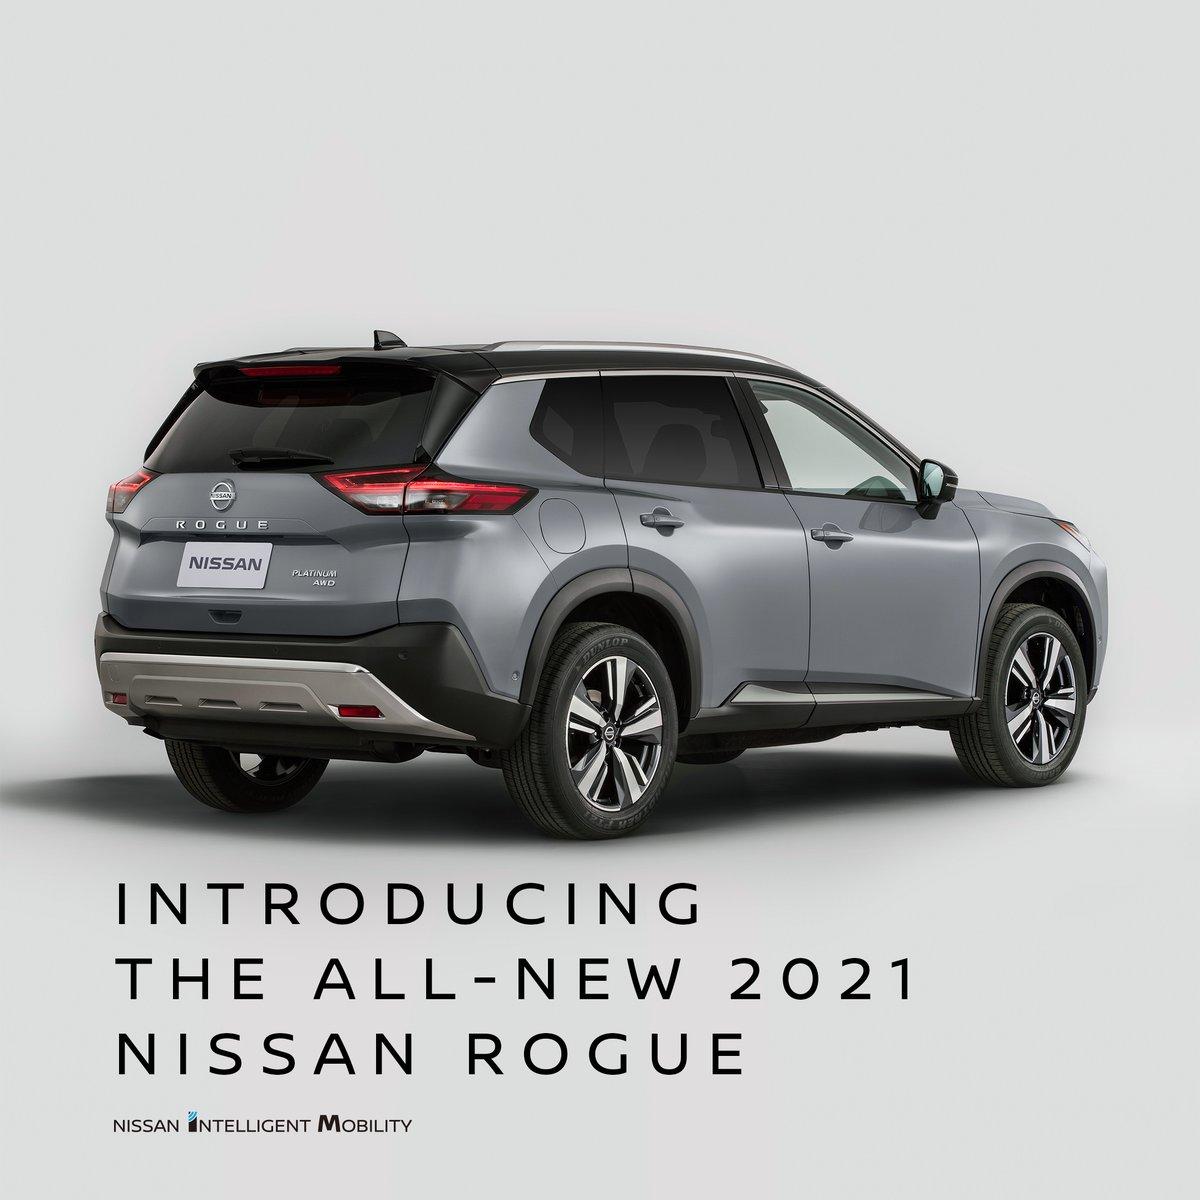 #RogueGoneRogue #NissanRogue2021